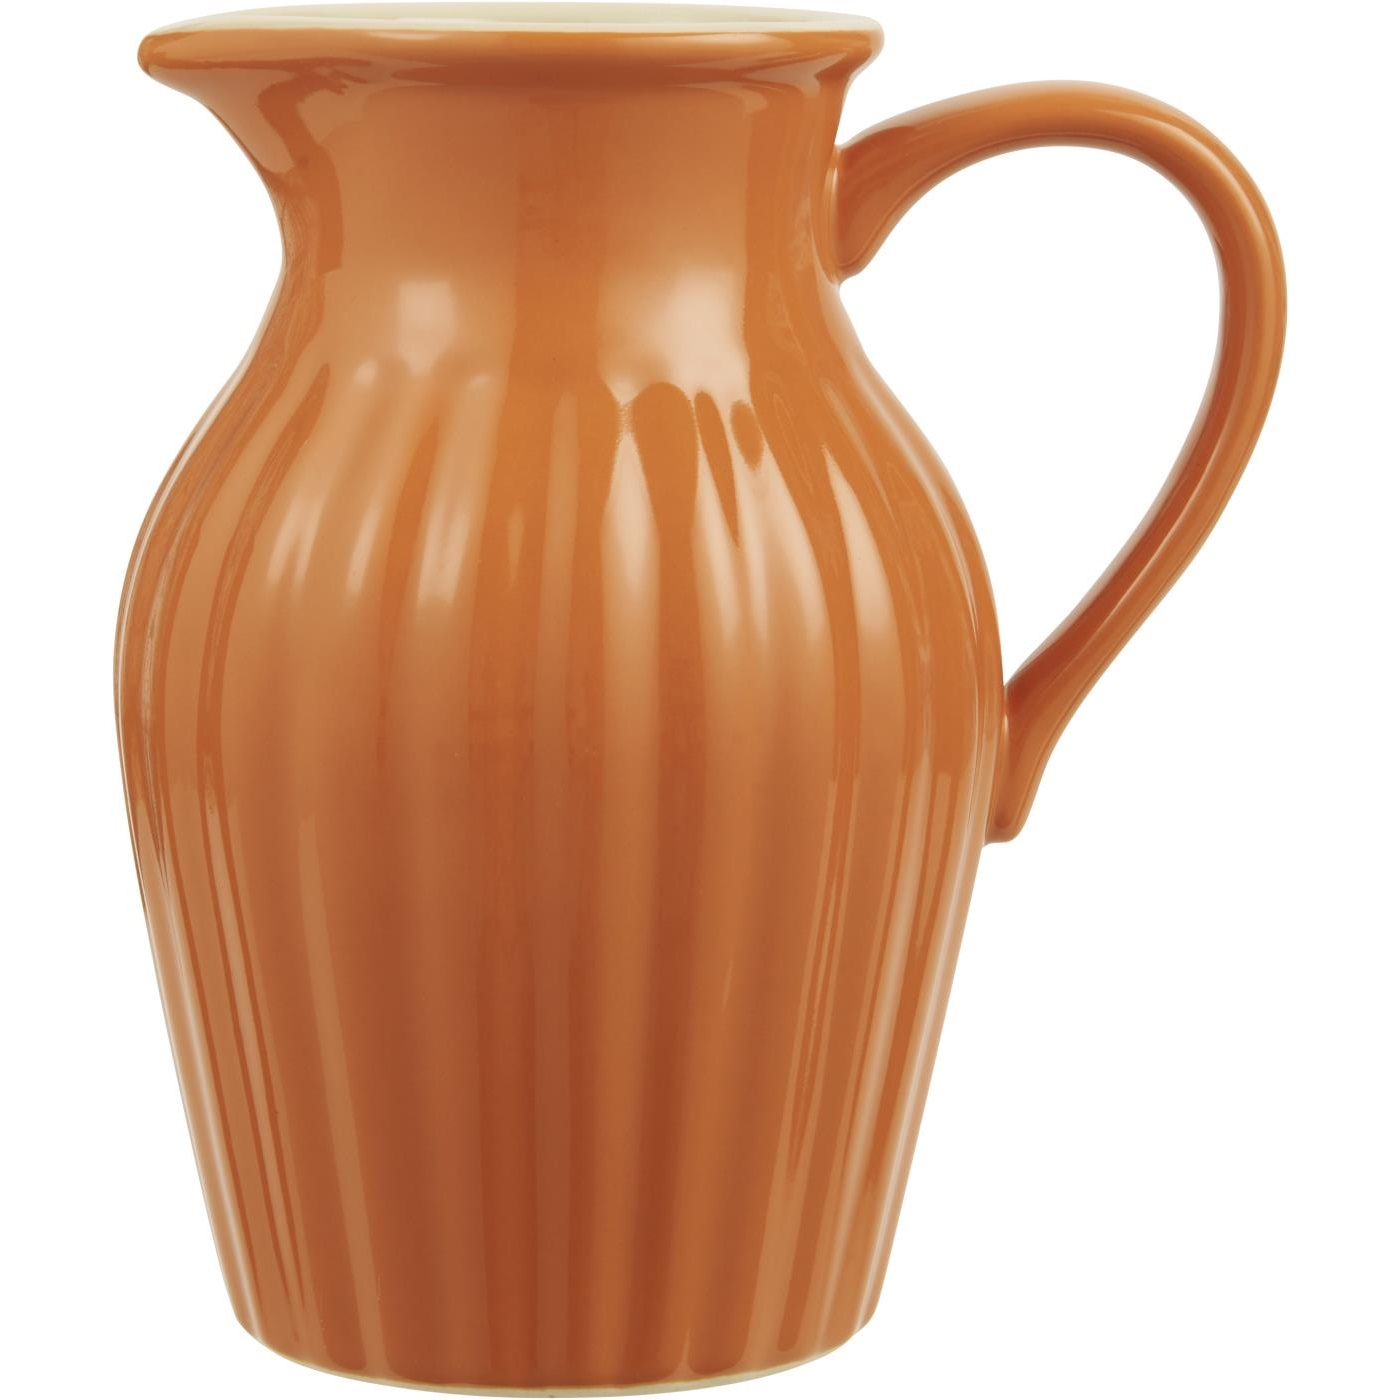 IB Laursen Kanne 1,7 Liter Mynte Pumpkin Spice